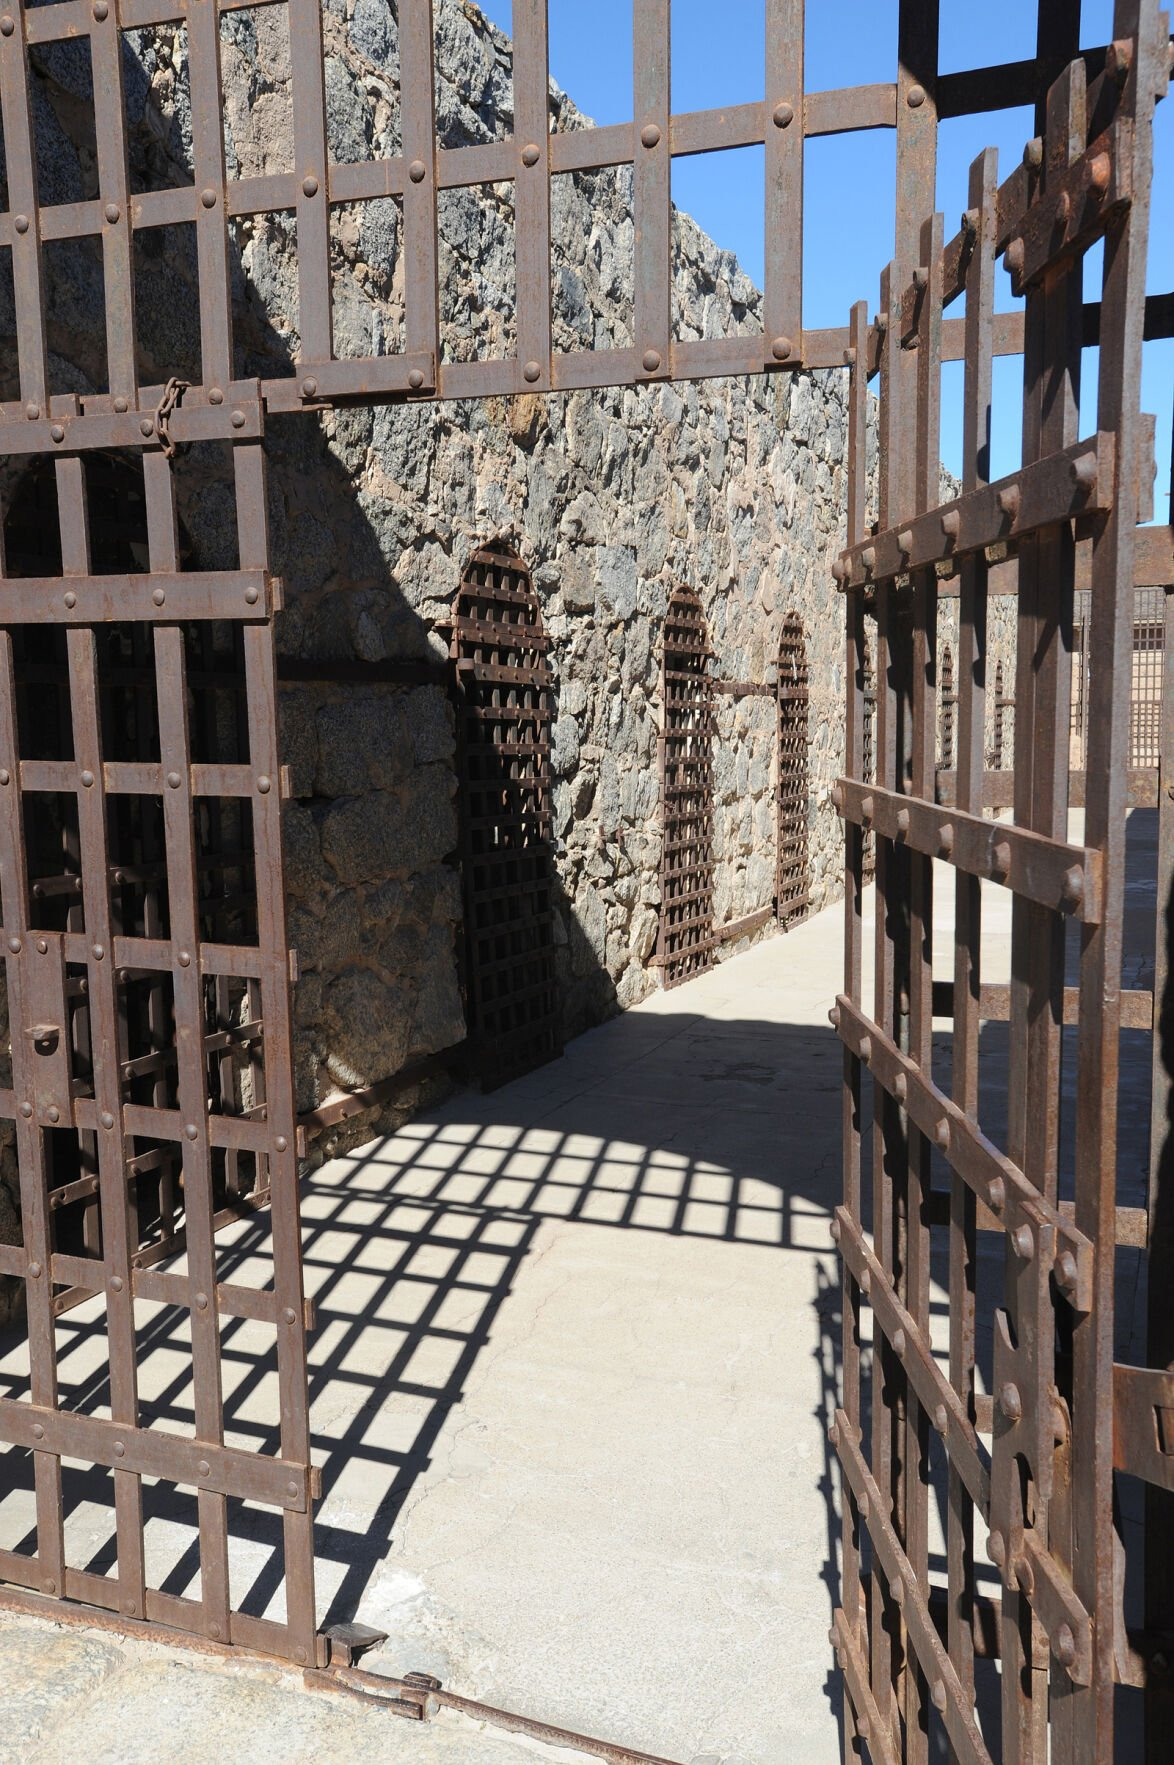 Territorial Prison